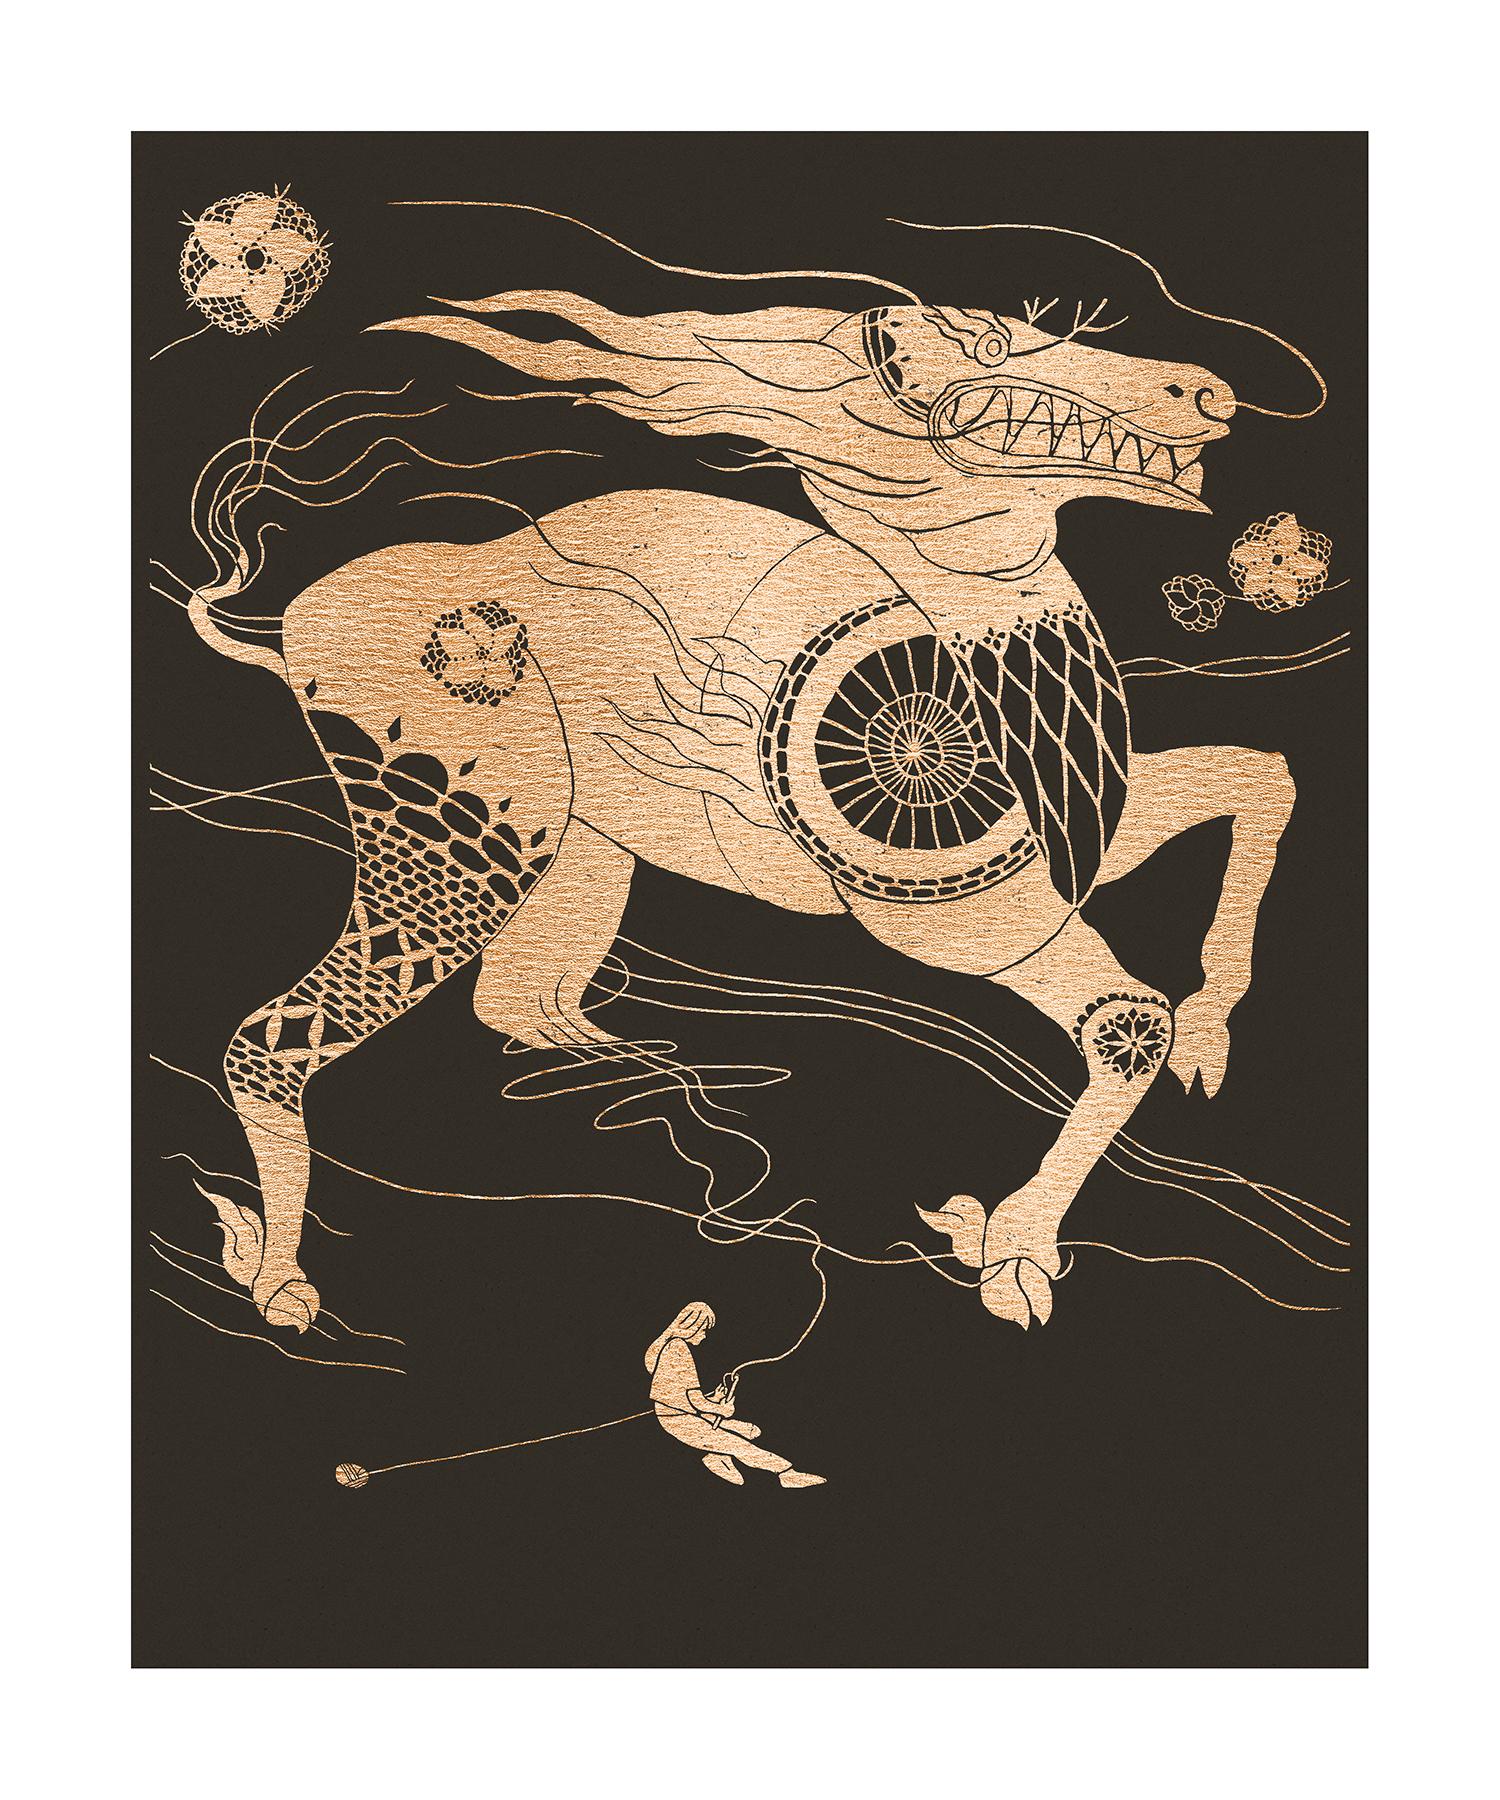 """The Bringer of Justice"" by Priscilla Boatwright"